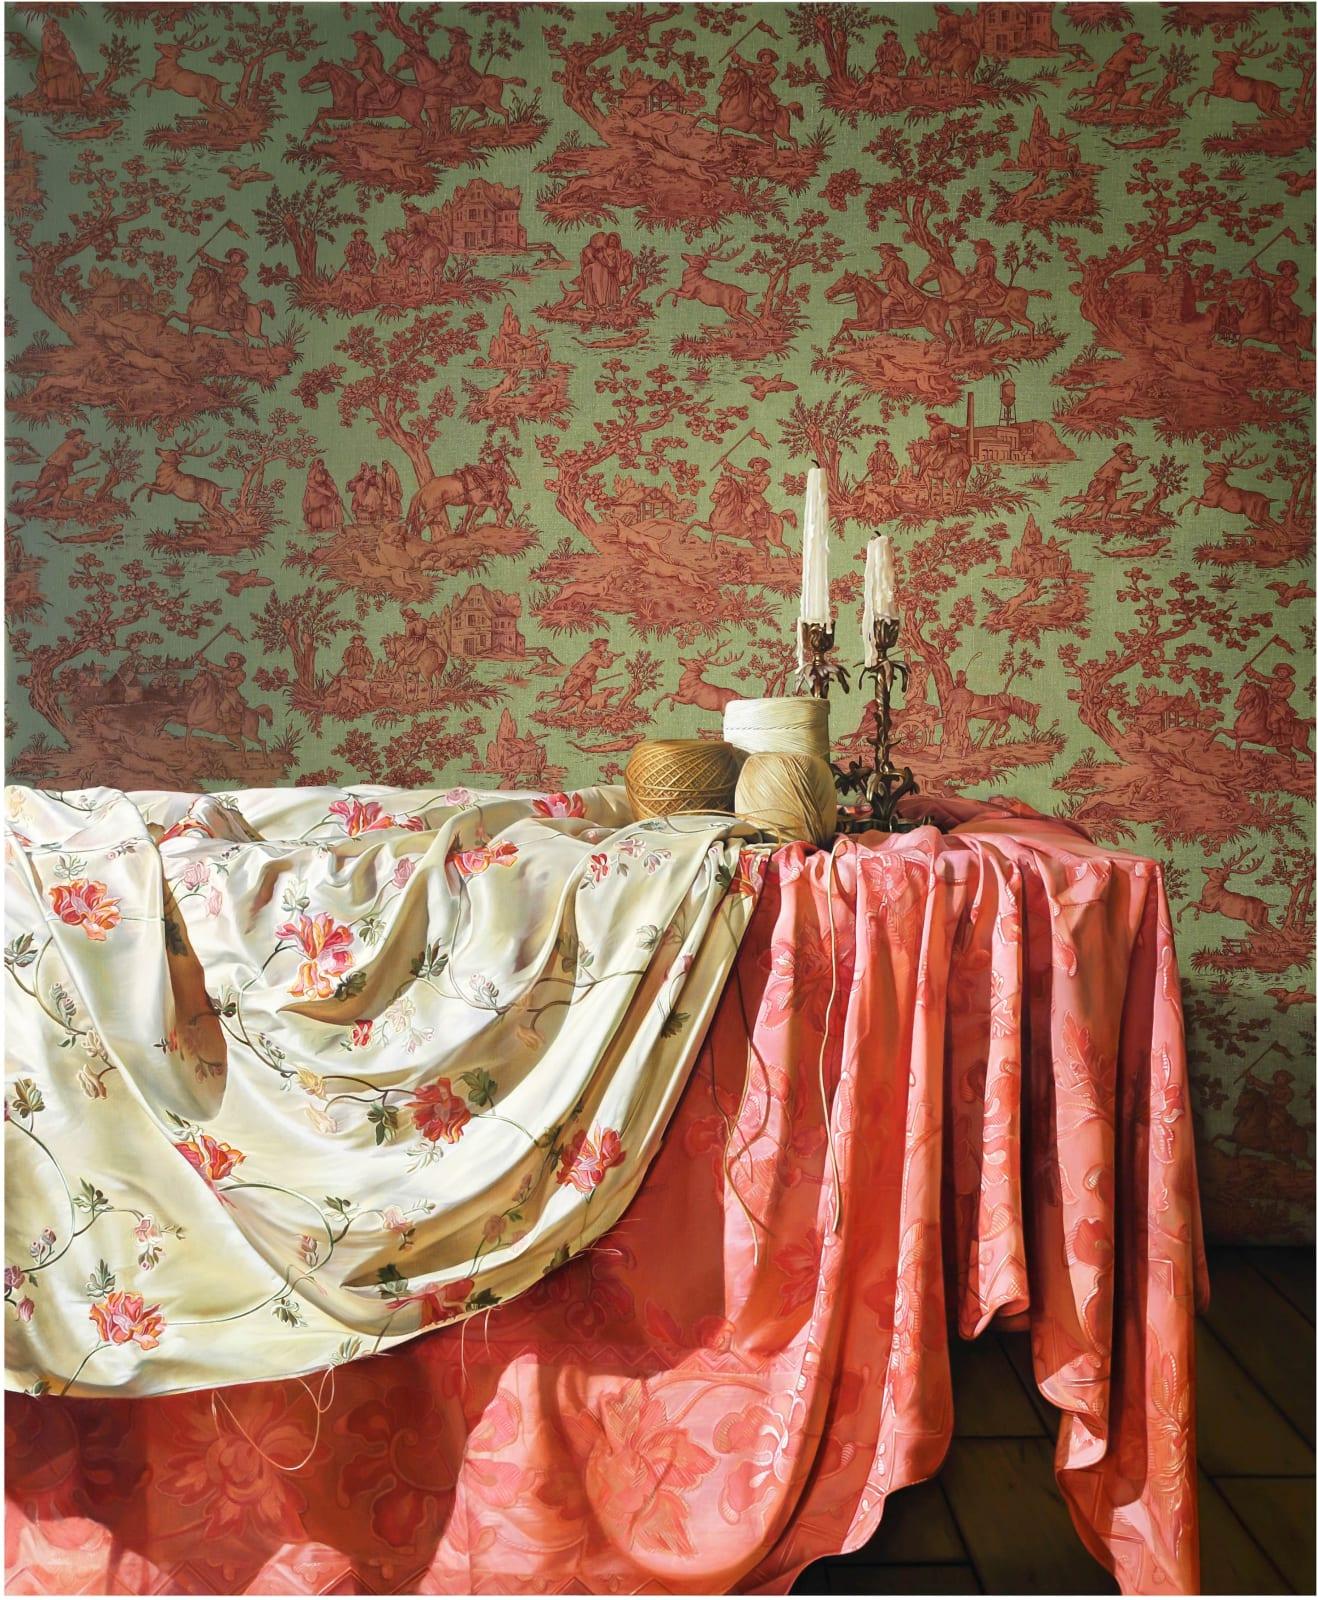 Jennifer Trouton  The ties that bind  Oil on linen  183 x 152cm